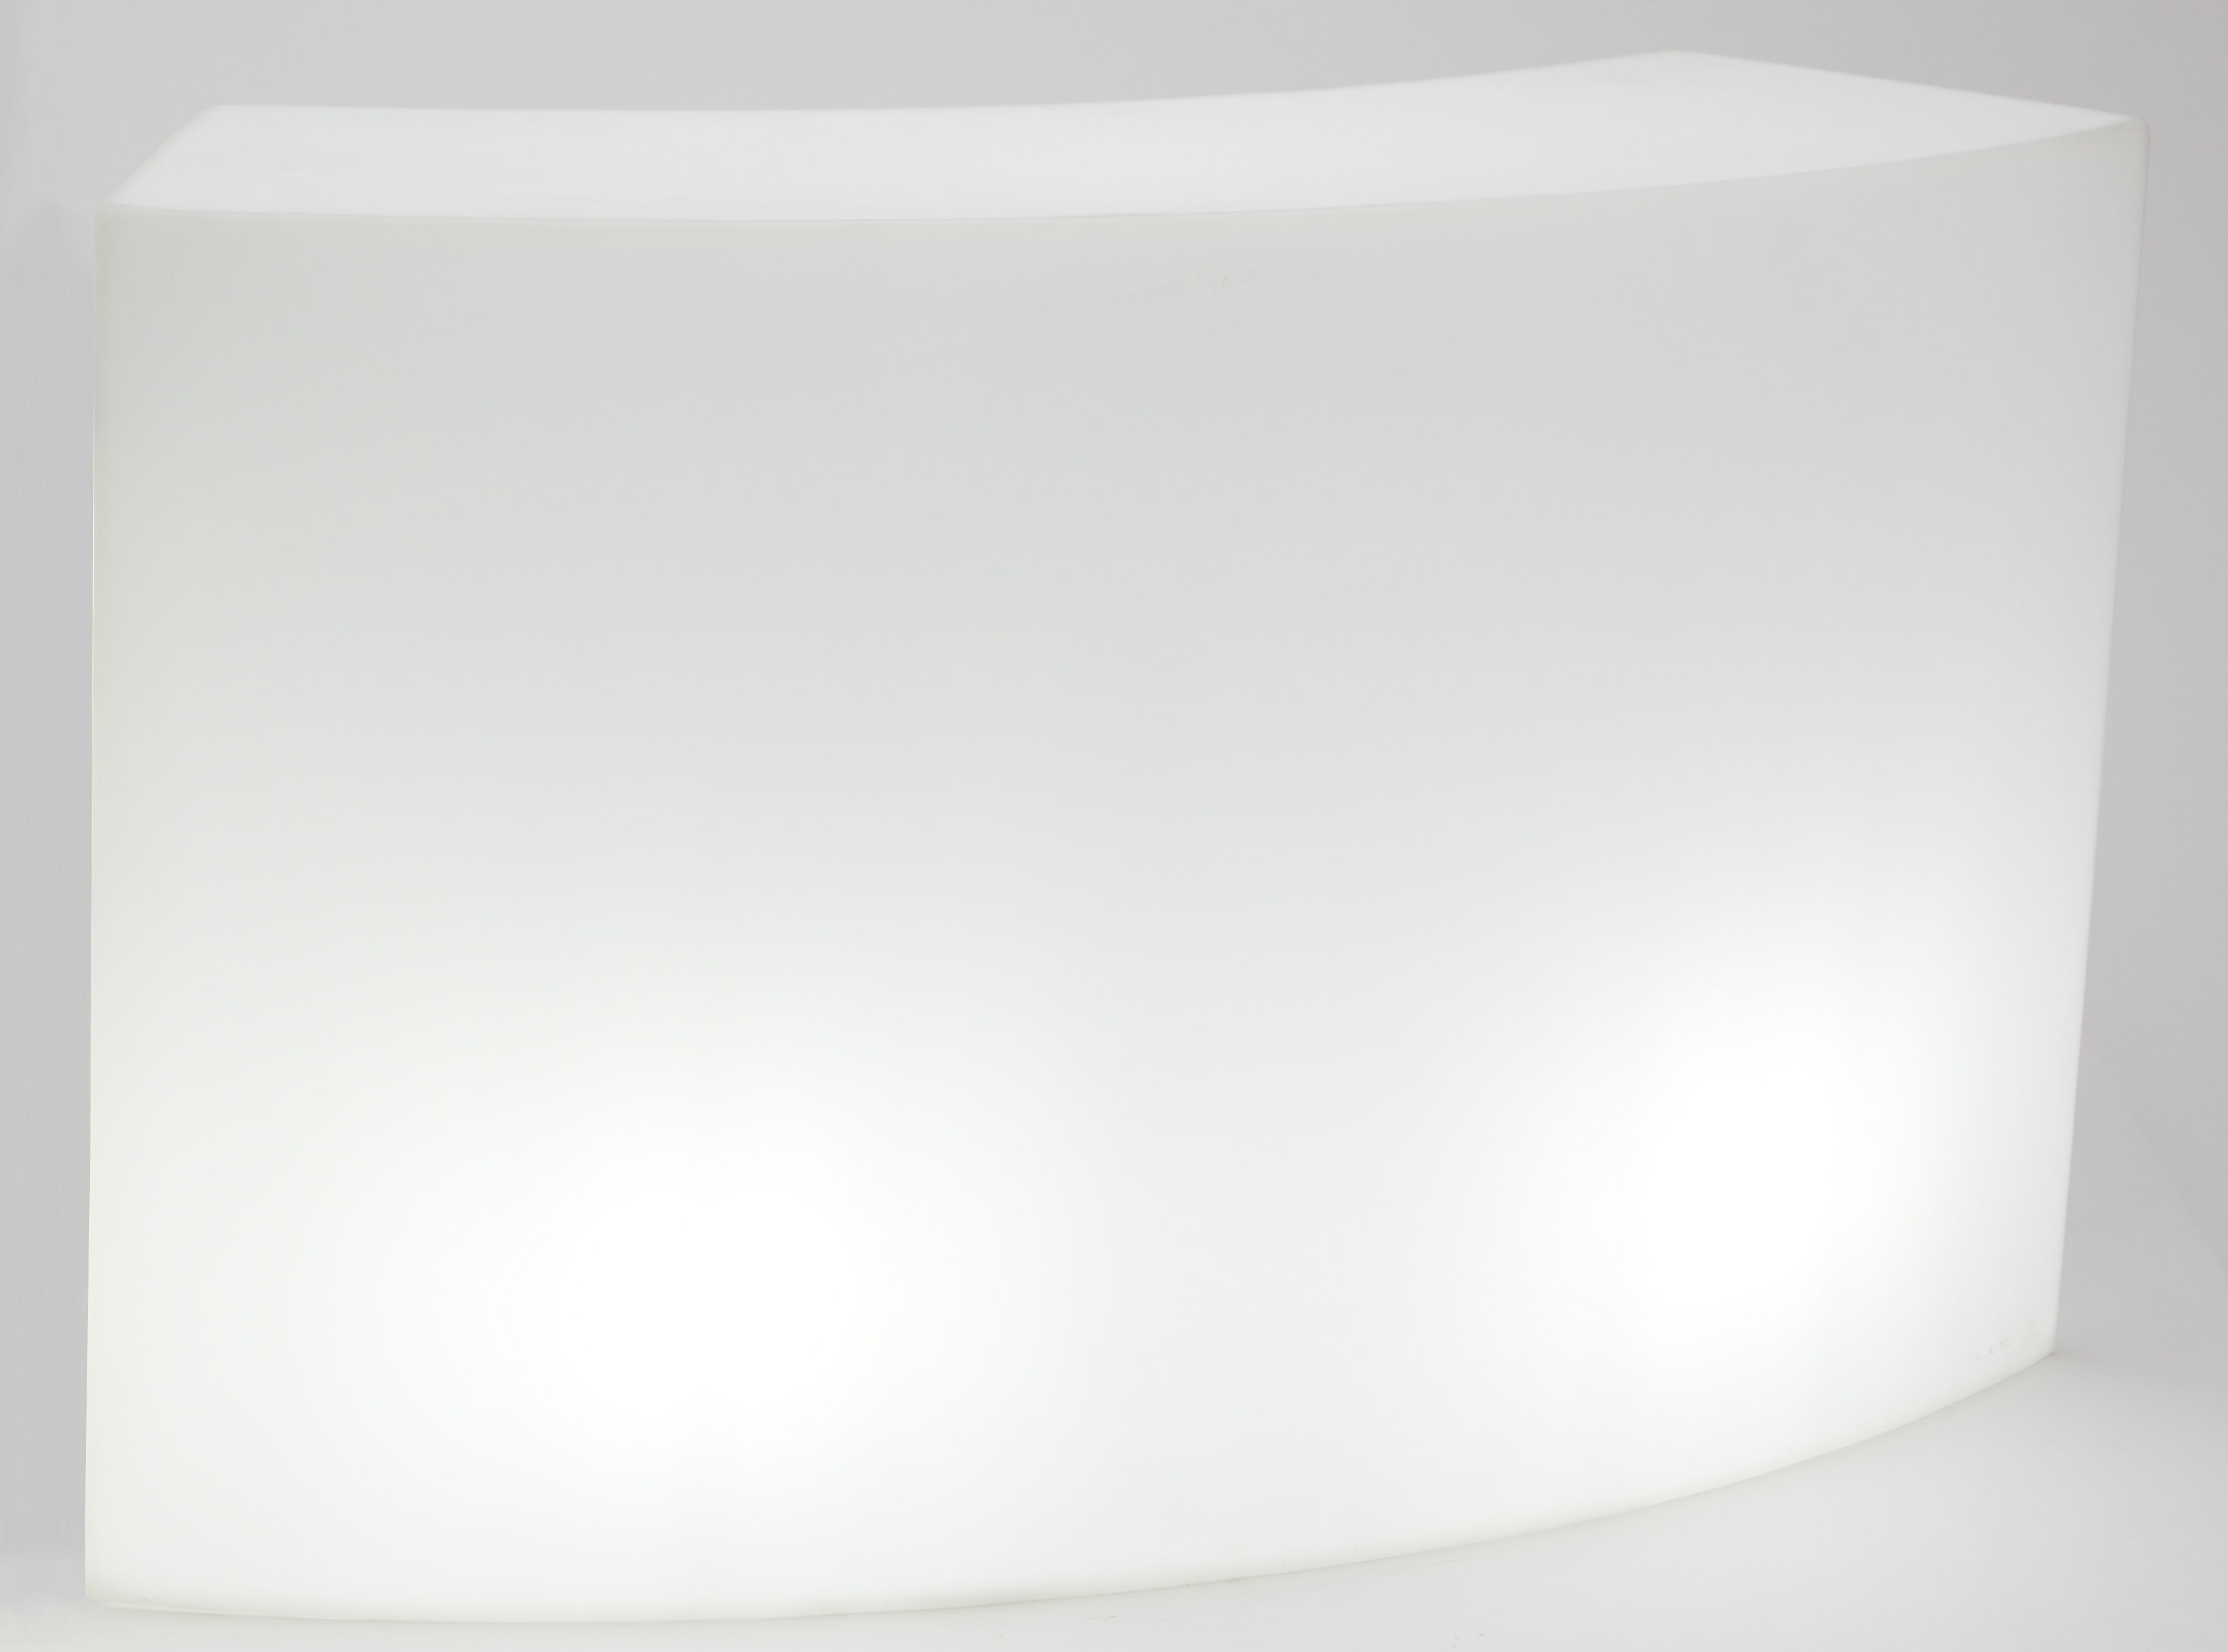 Mobilier - Mange-debout et bars - Bar lumineux Snack LED RGB / L 165 cm - Sans fil - Slide - Blanc - Polyéthylène